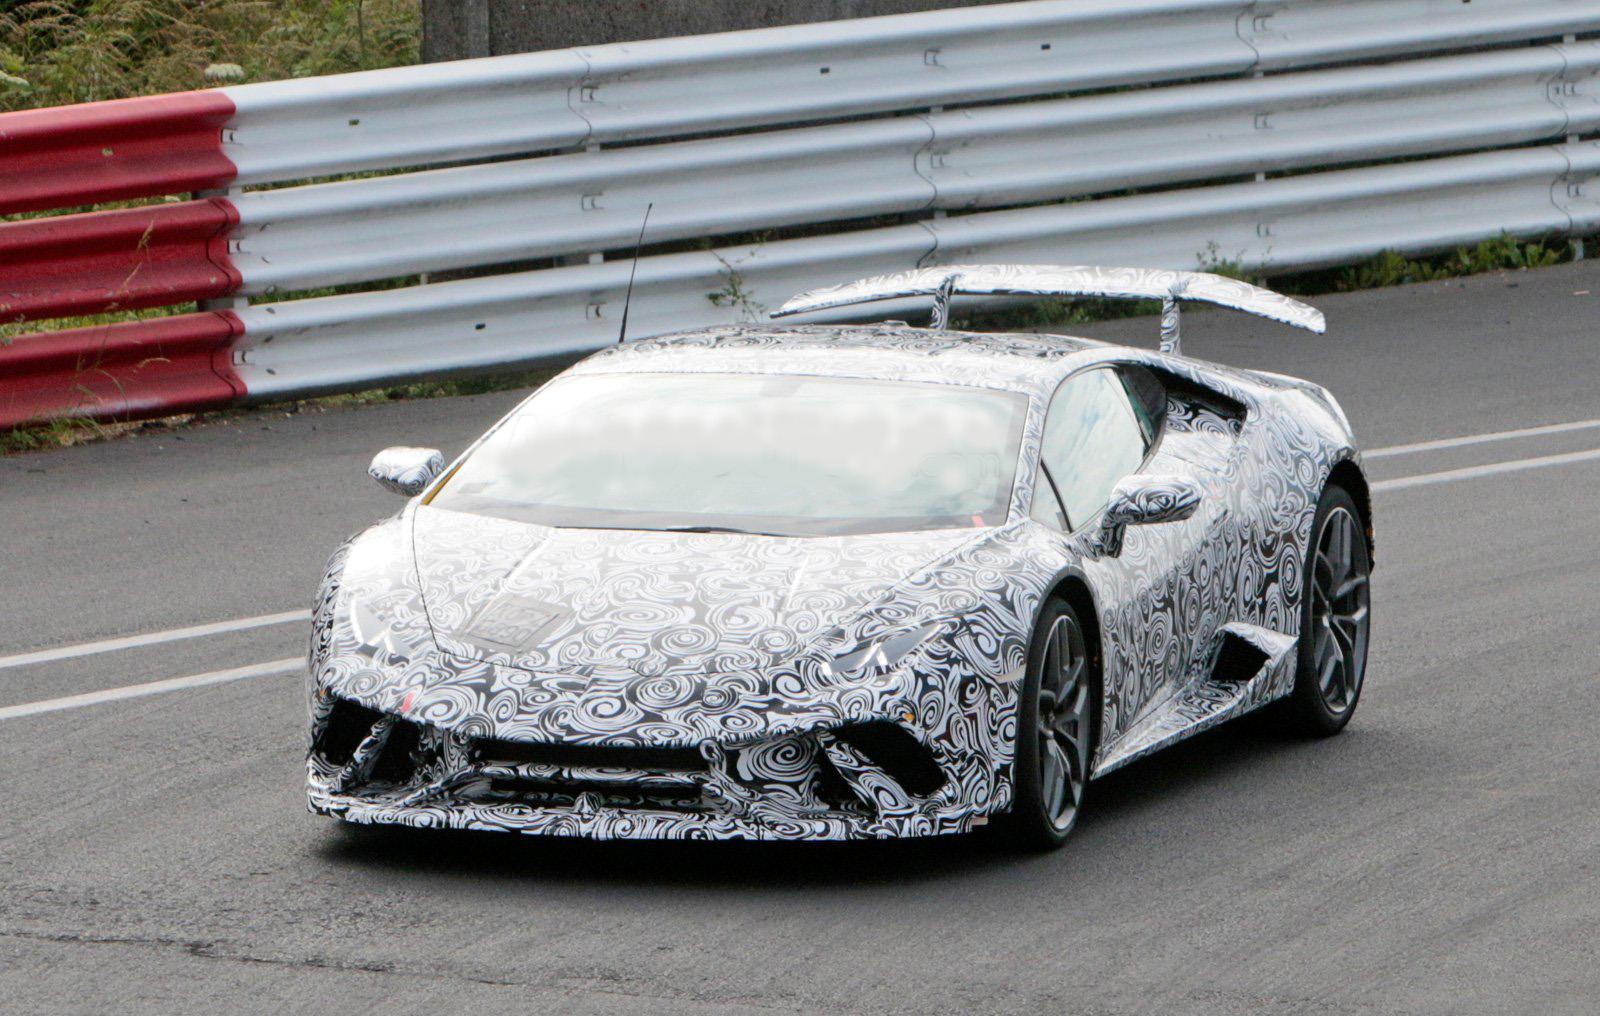 Lamborghini Huracan Superleggera Spied with Ultra Aggressive Styling